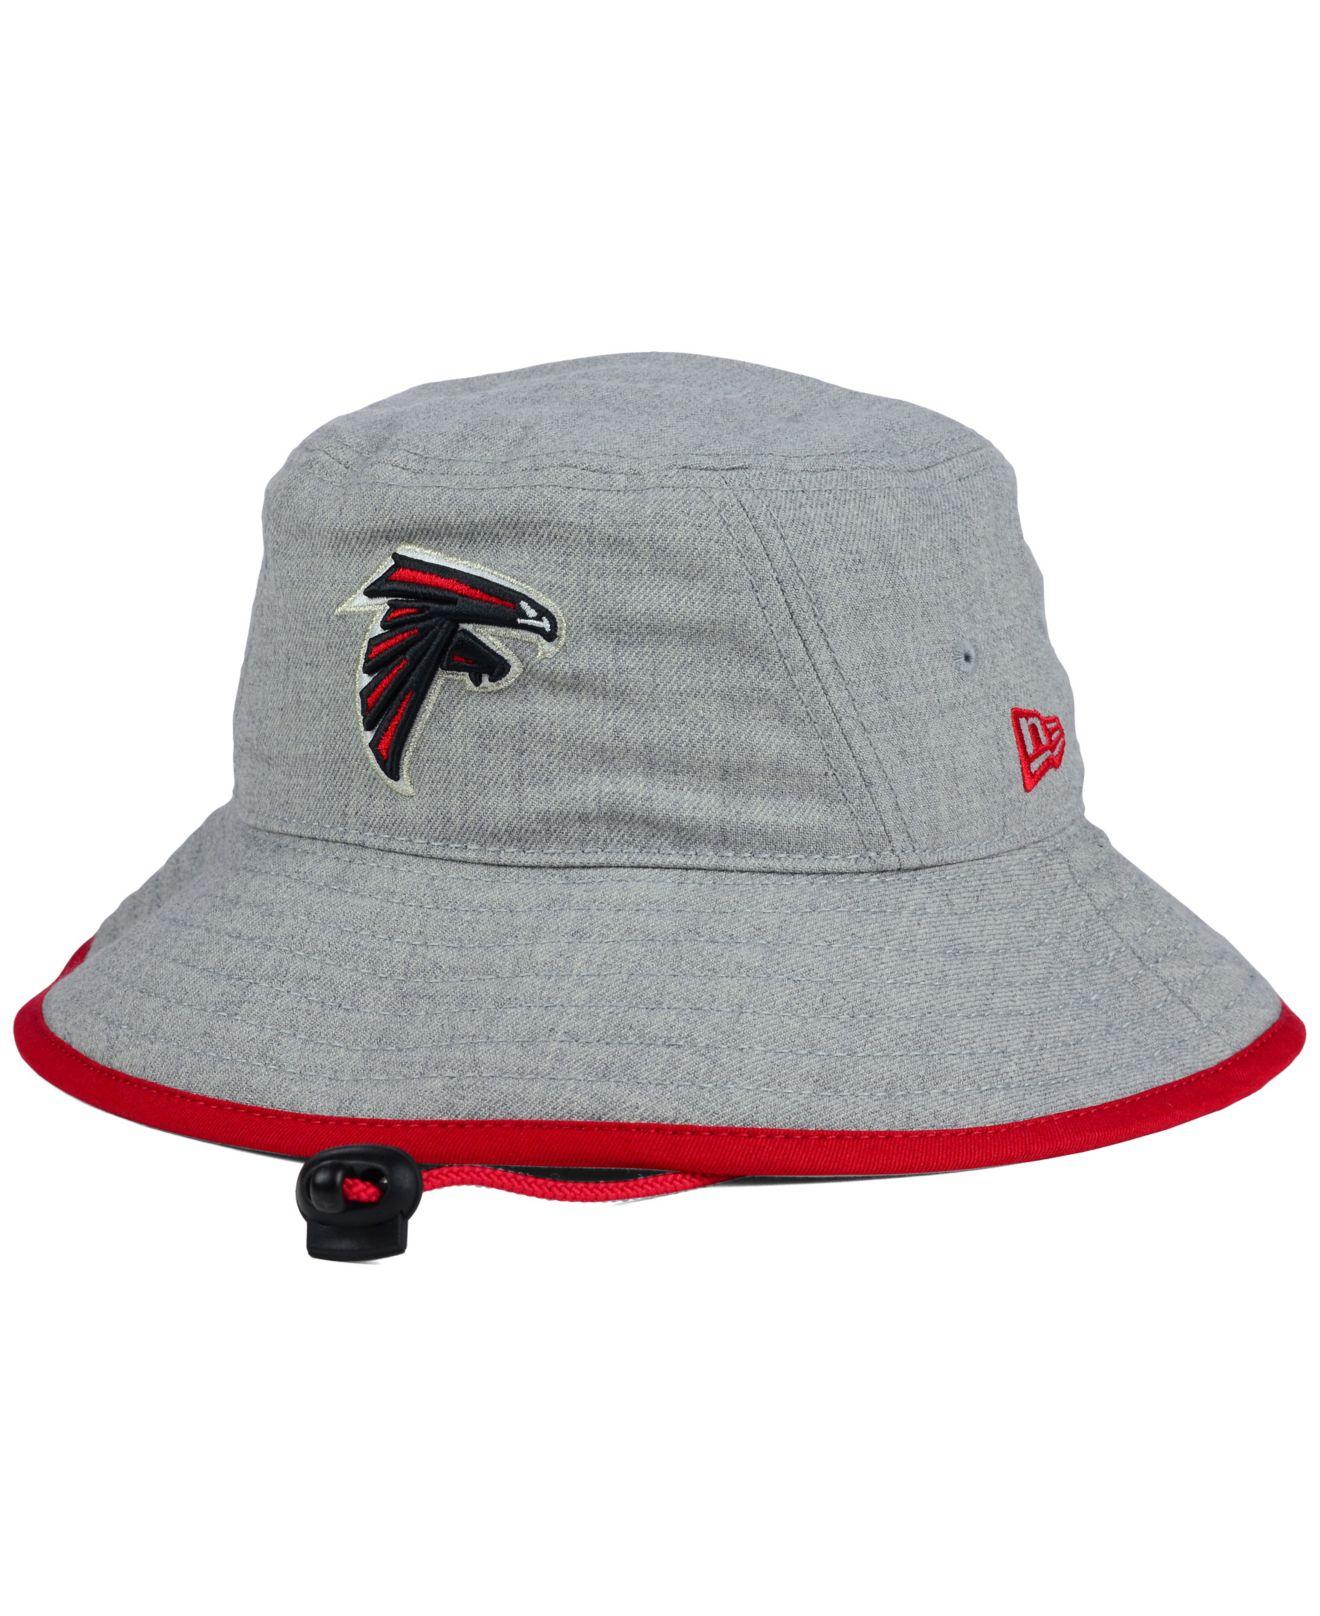 4a1e9128ce KTZ Atlanta Falcons Nfl Heather Gray Bucket Hat in Gray for Men - Lyst